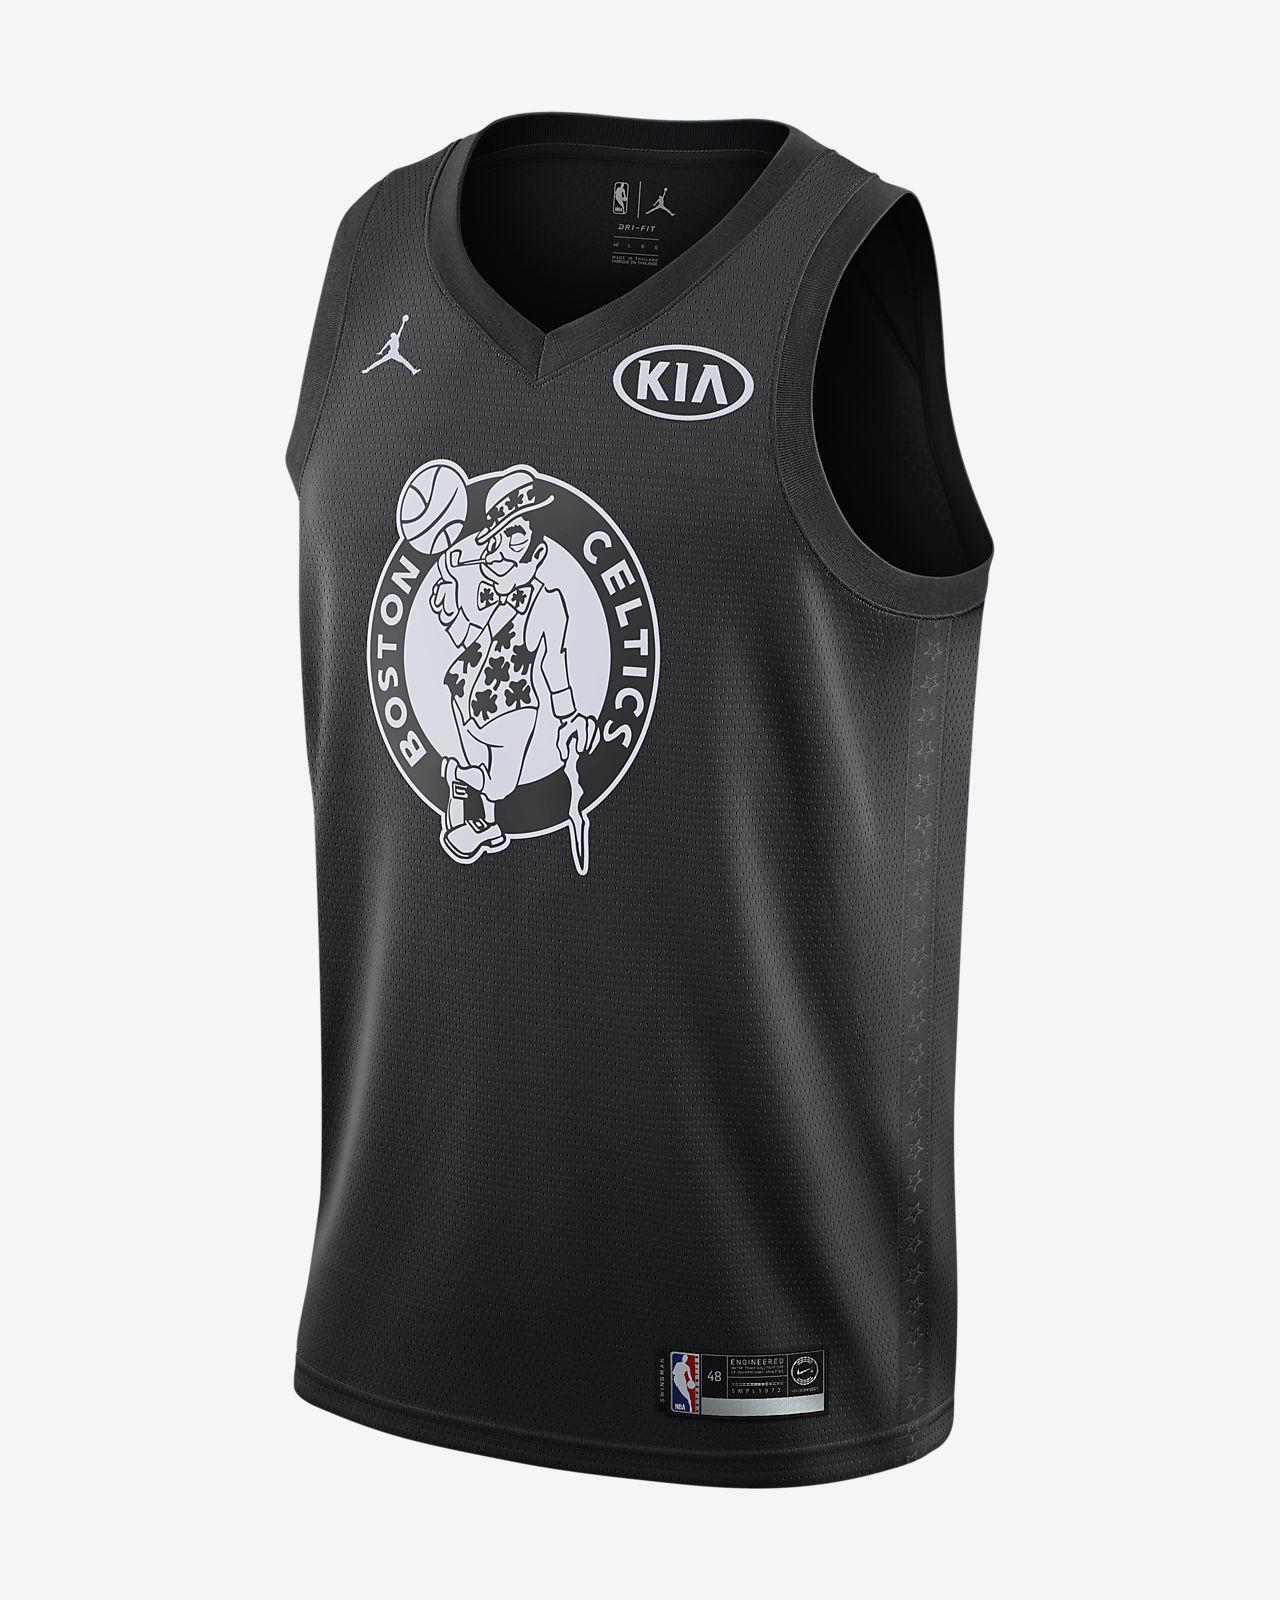 ... Kyrie Irving All-Star Edition Swingman Jersey Men's Jordan NBA  Connected Jersey